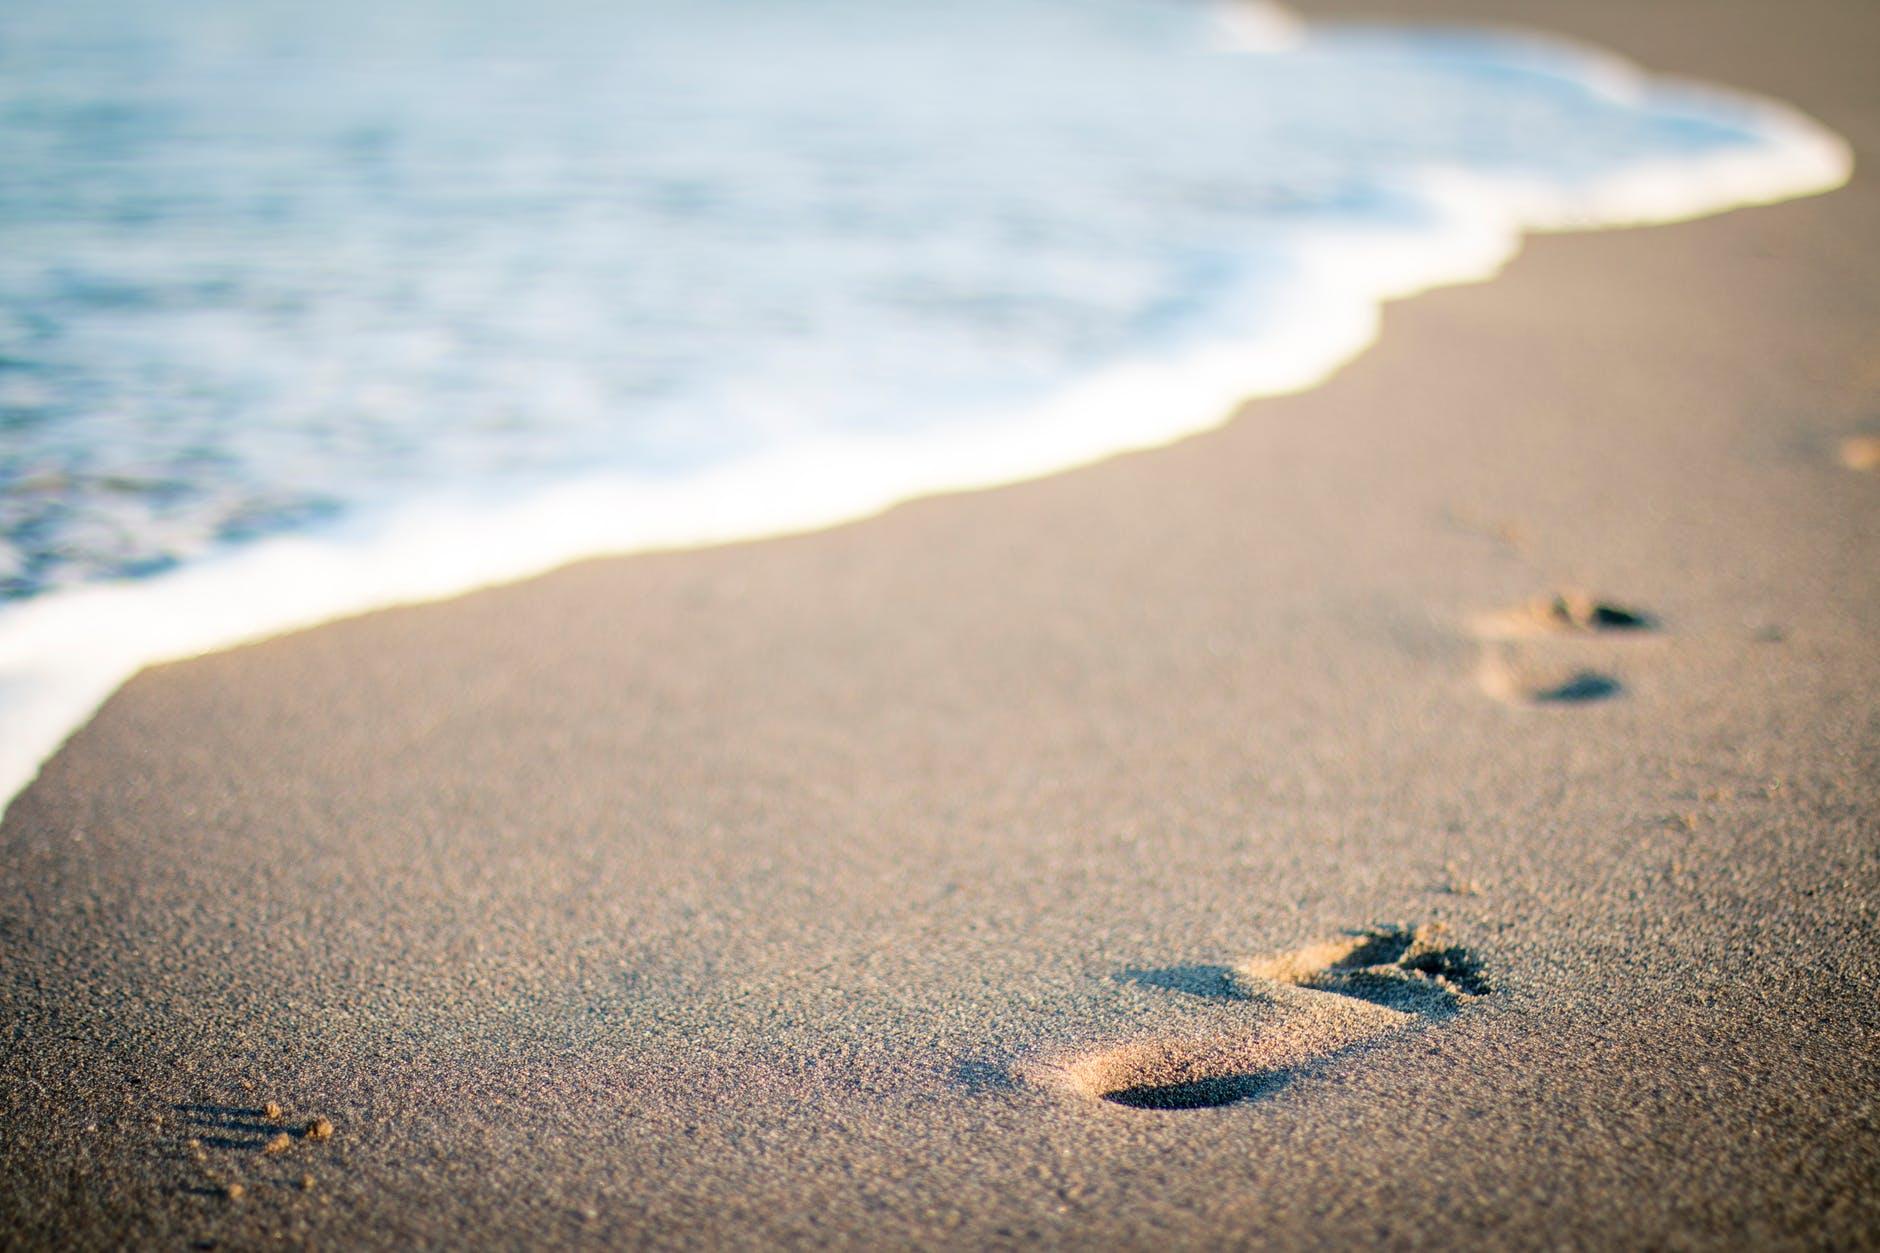 fodspor-ved-strand